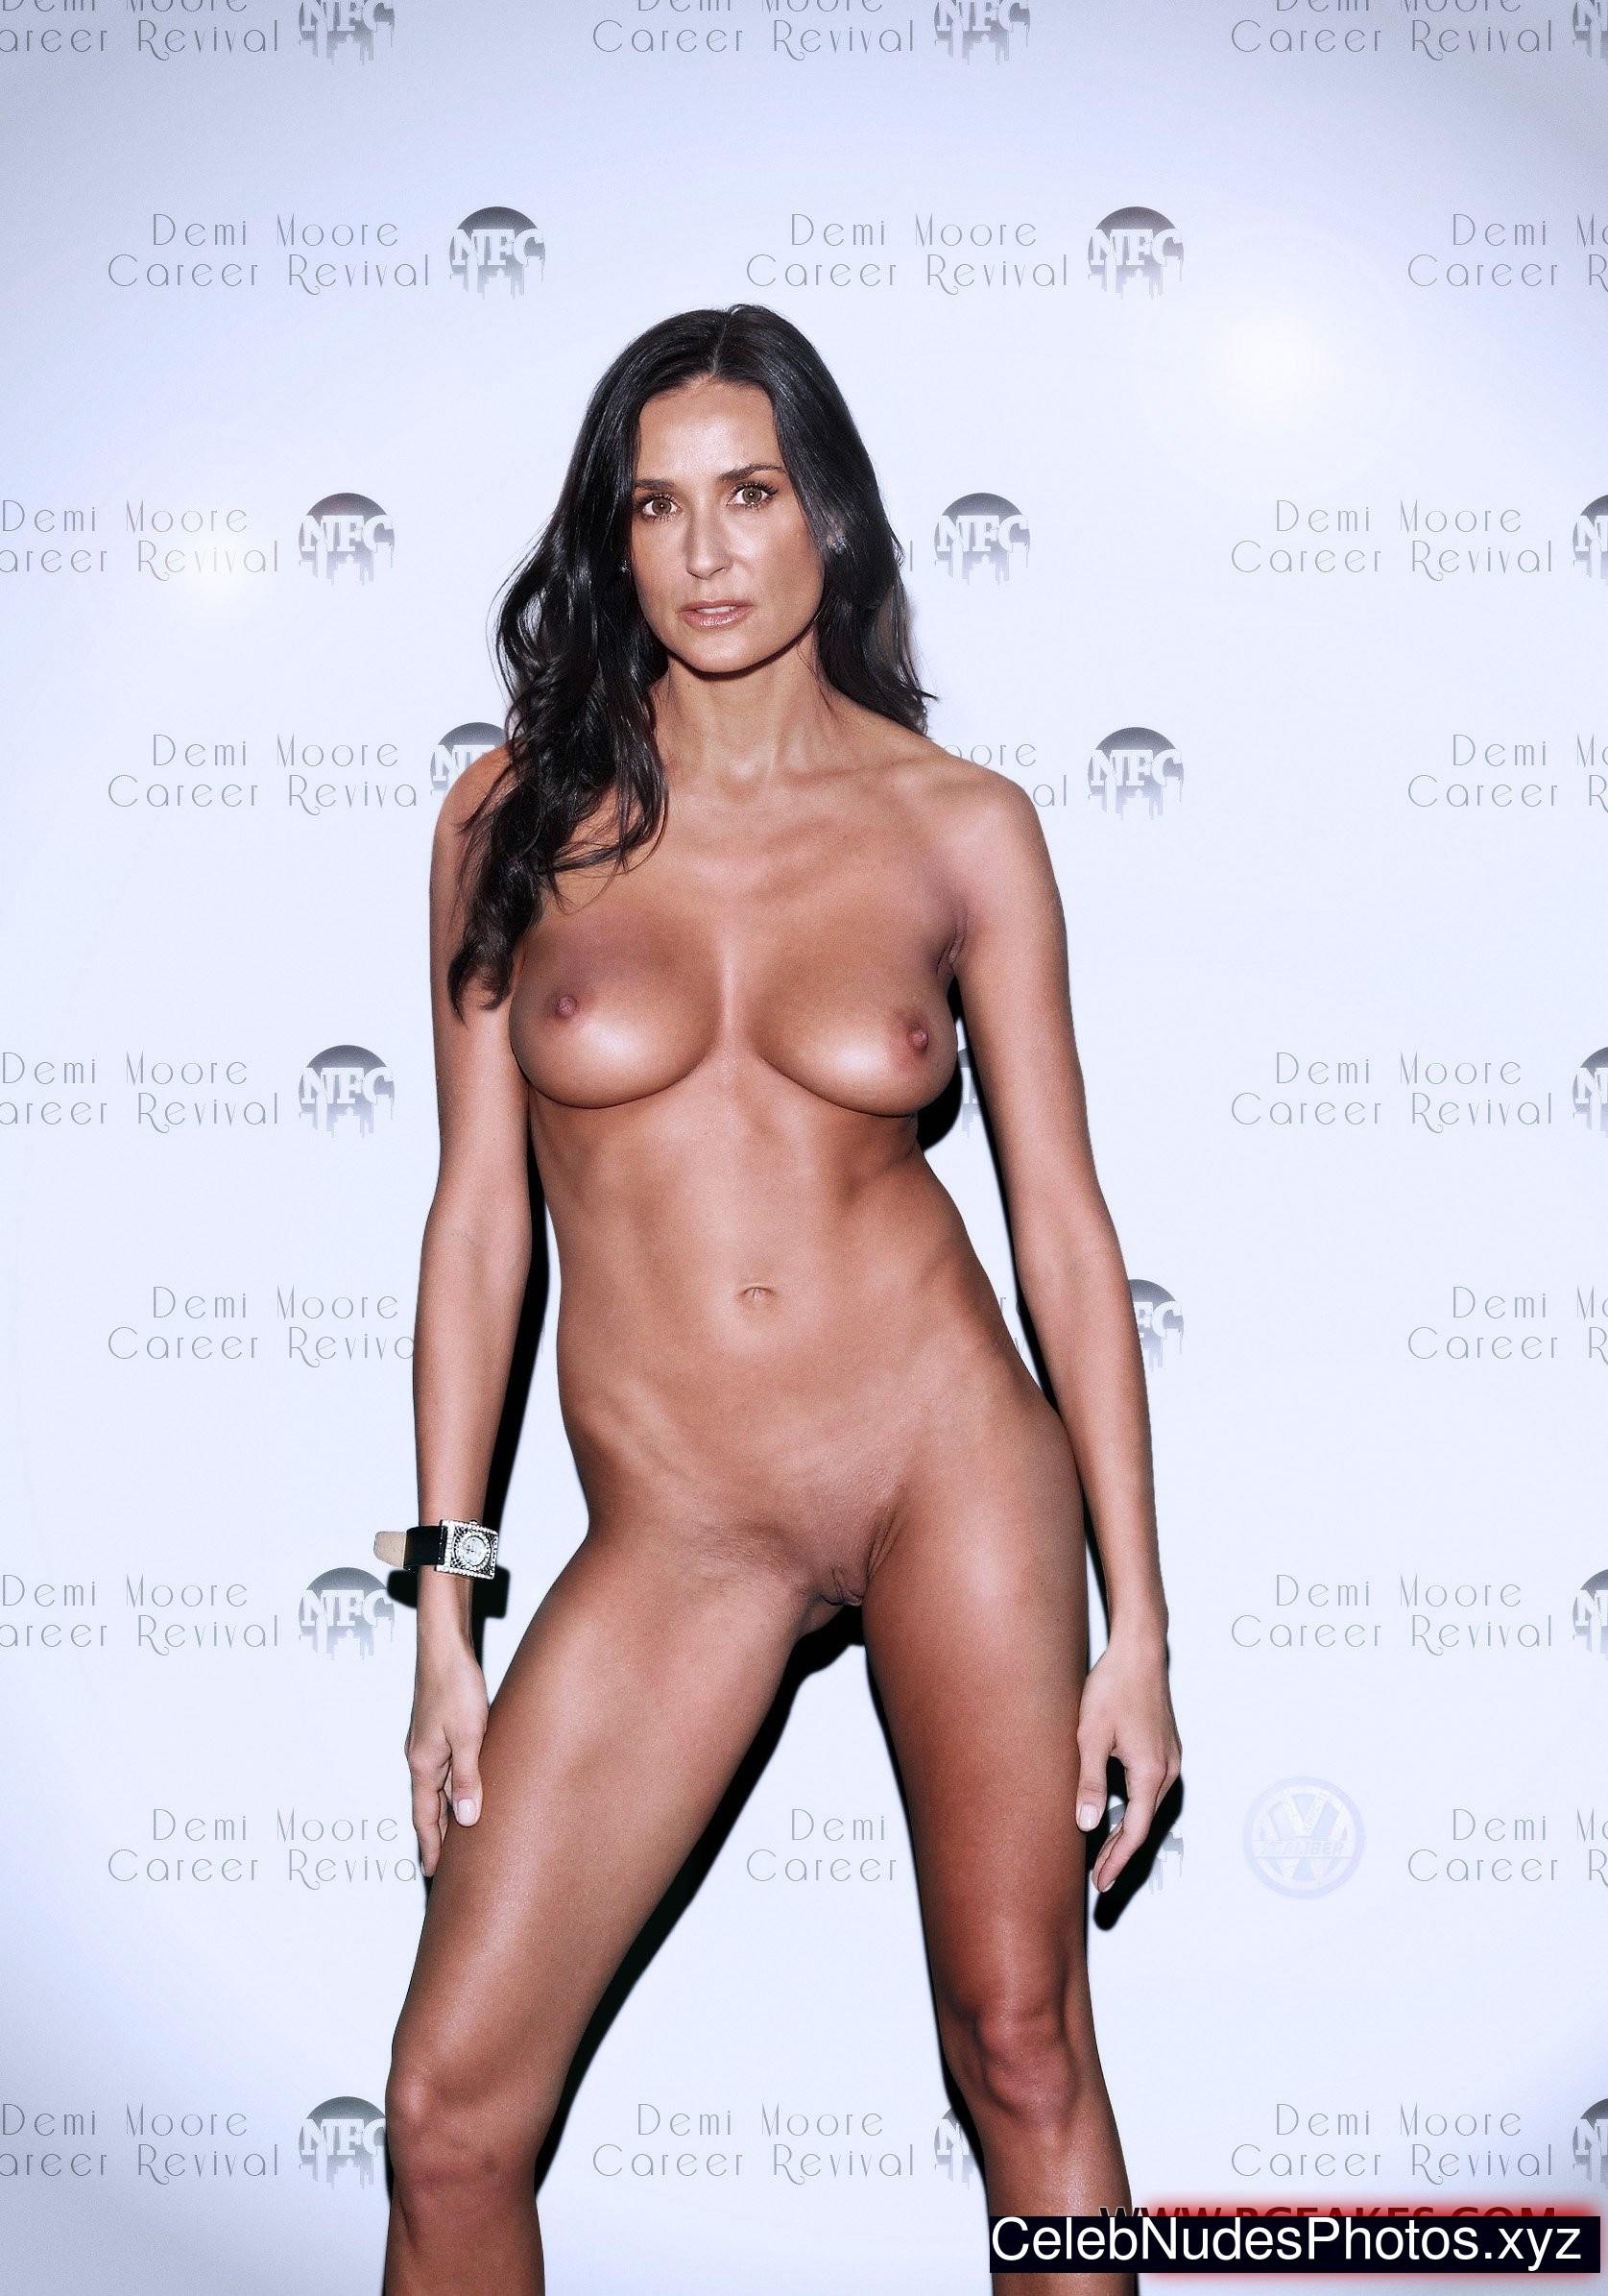 Nudist prepubescent girls video